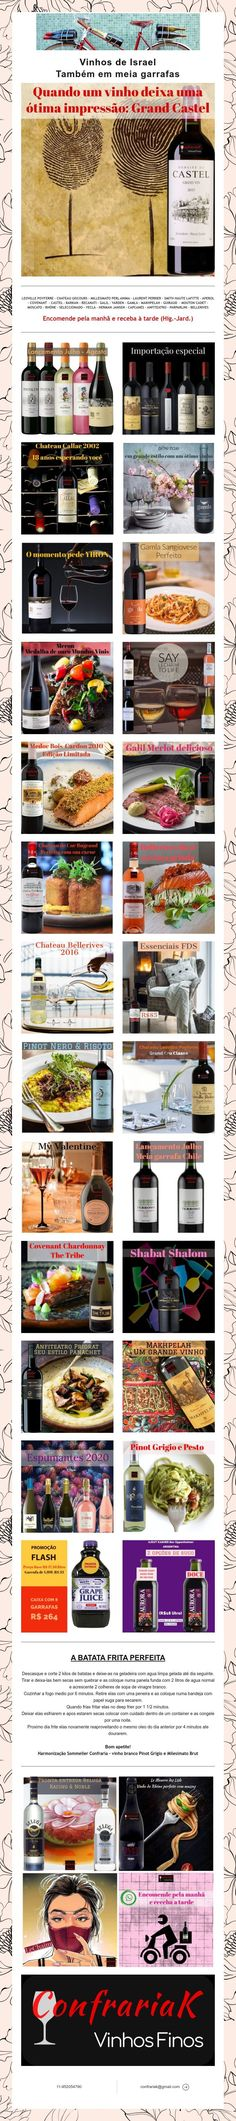 Vinhos de Israel  Também em meia garrafas Mouton Cadet, Laurent Perrier, Israel, Wine Pairings, Sock, Bottles